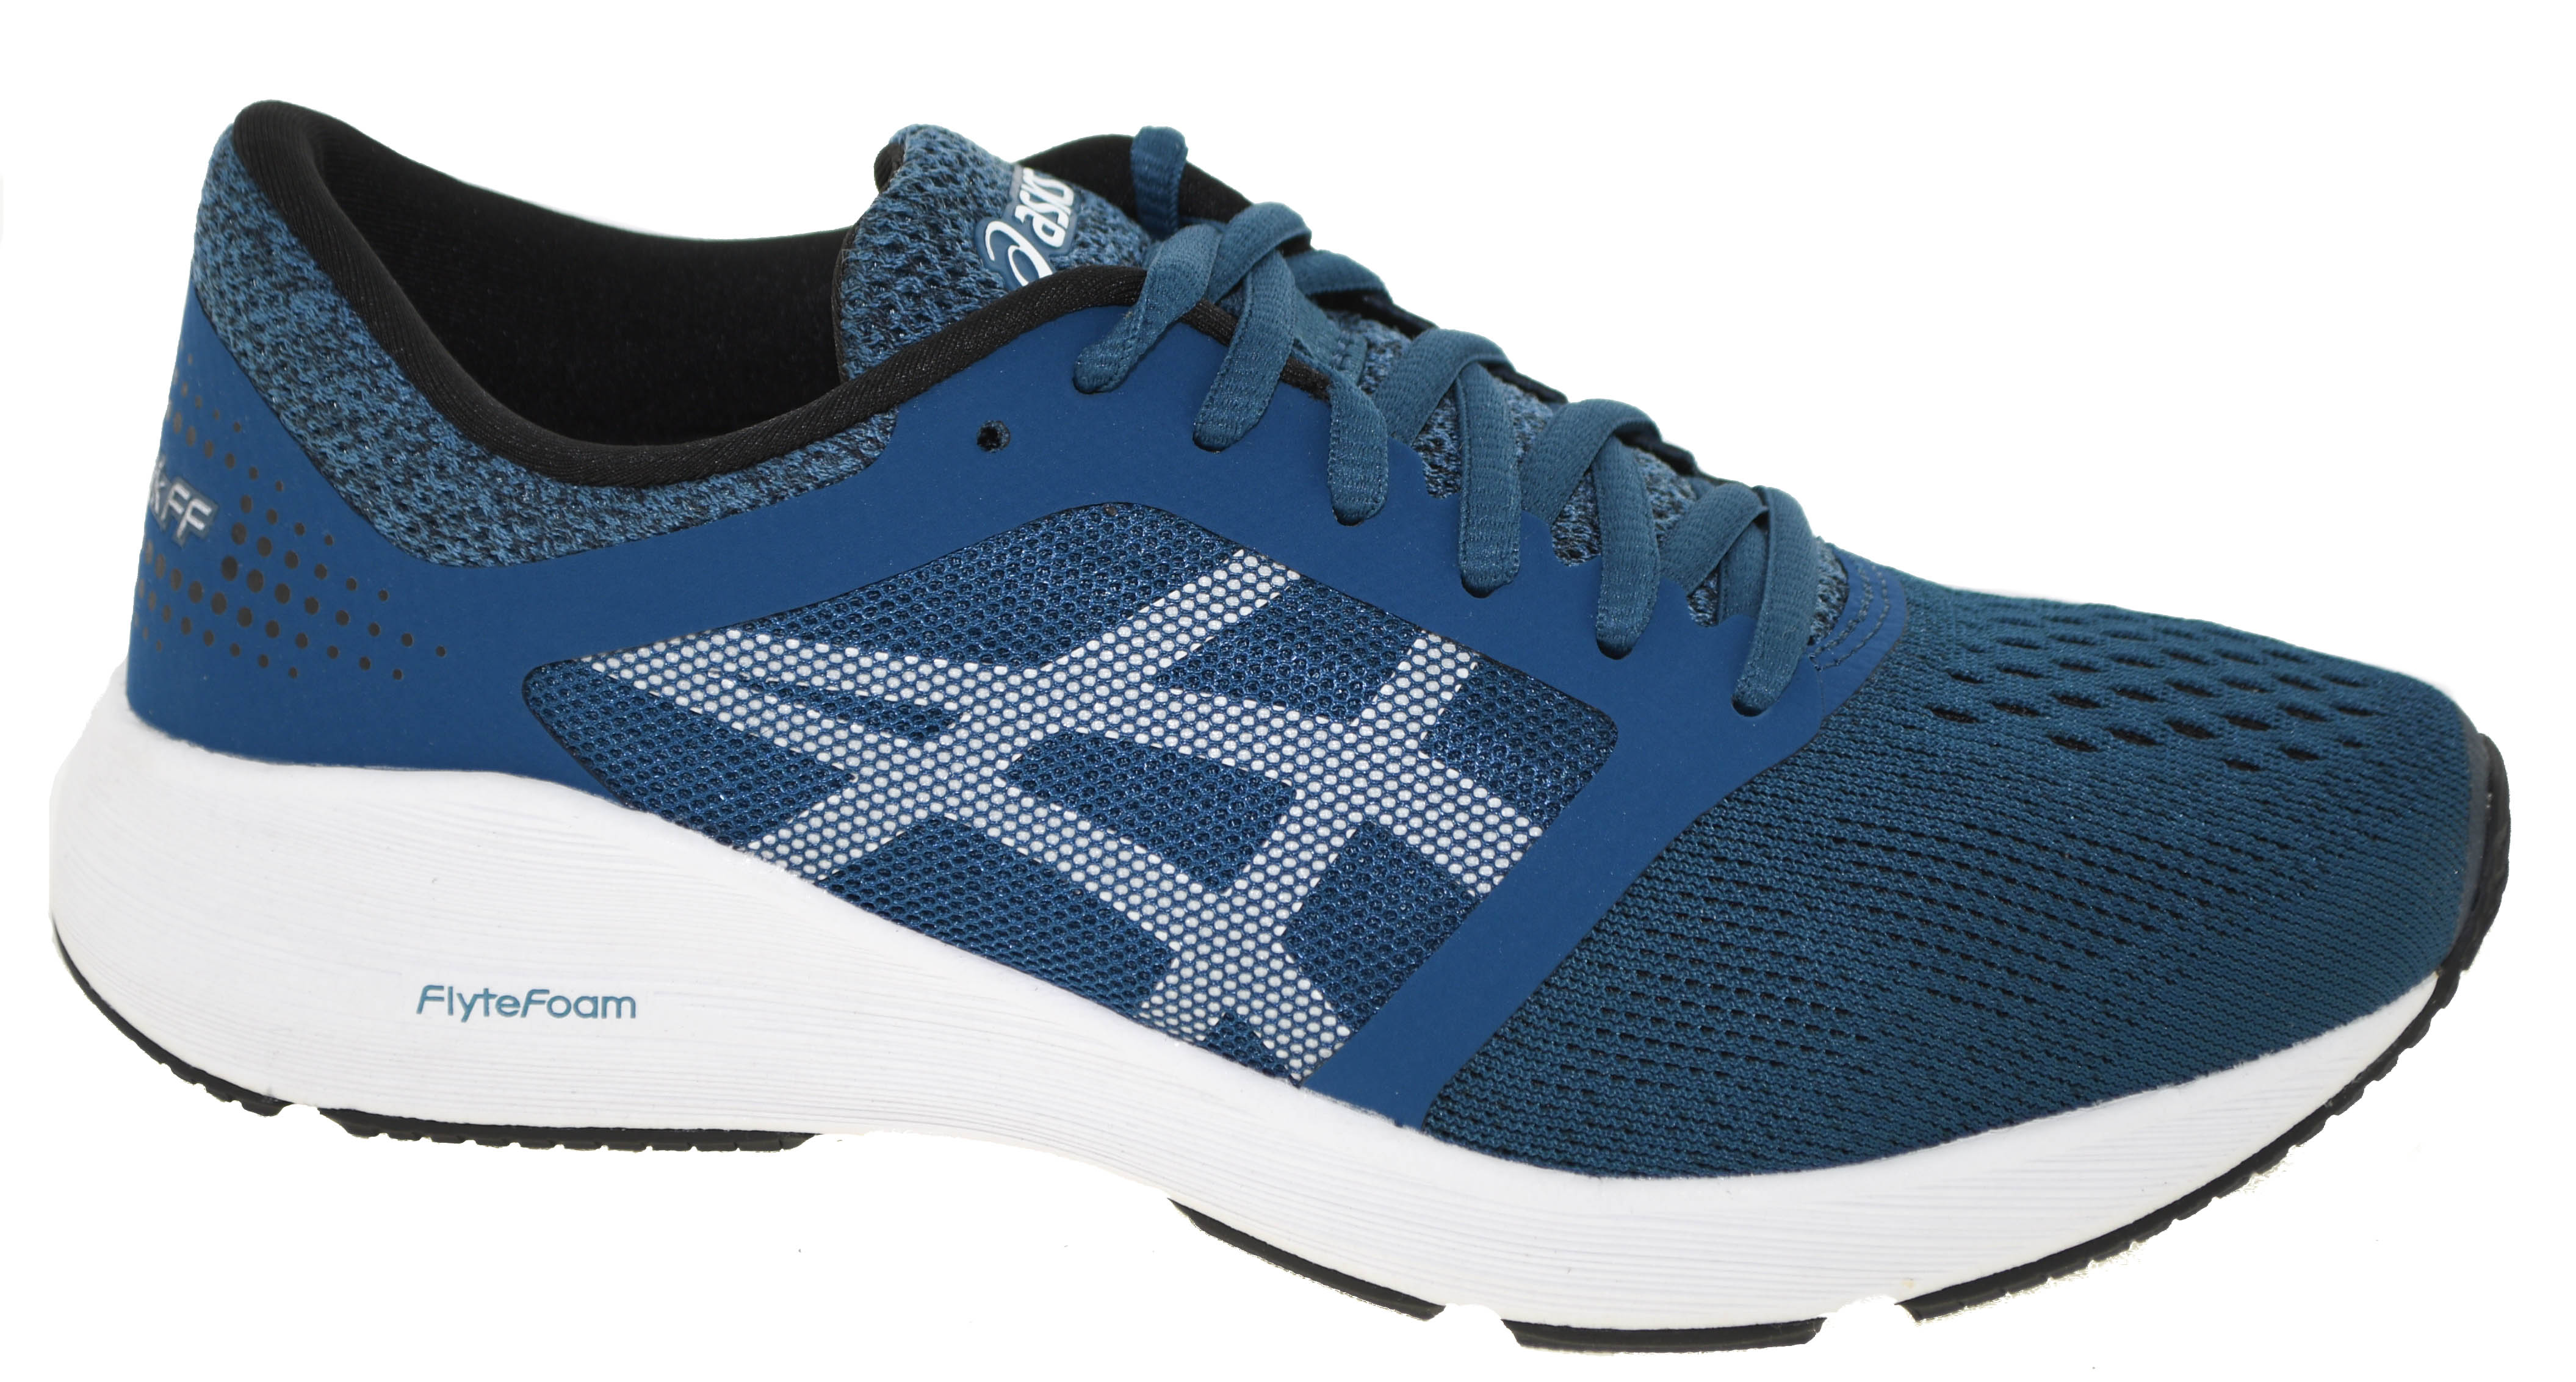 00766cef3a33 Asics Men s Roadhawk FF Running Shoes Ink Blue White Black Style 4501